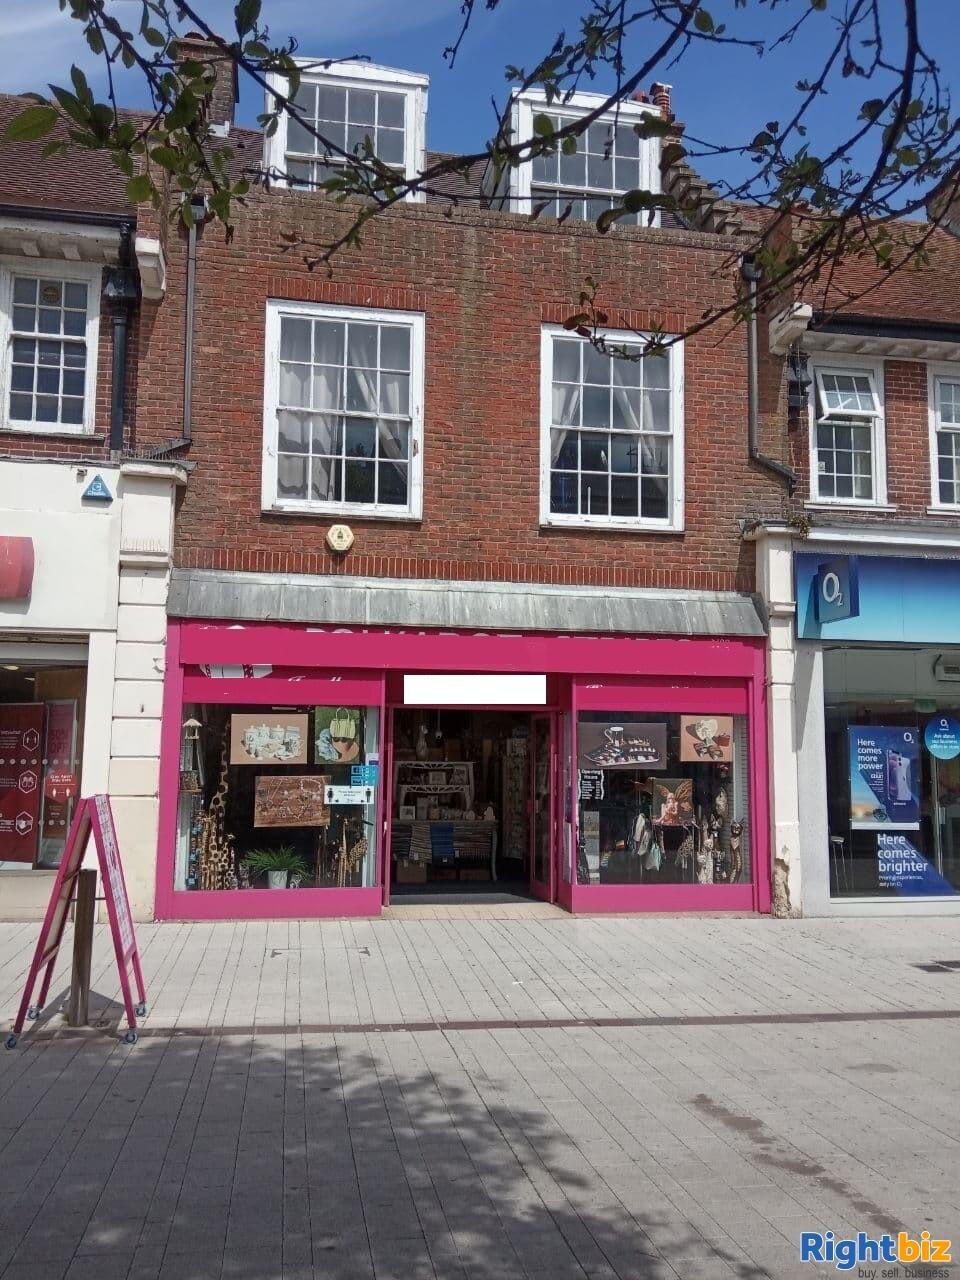 Gifts & Home Accessories Shop - Bognor Regis - Image 1